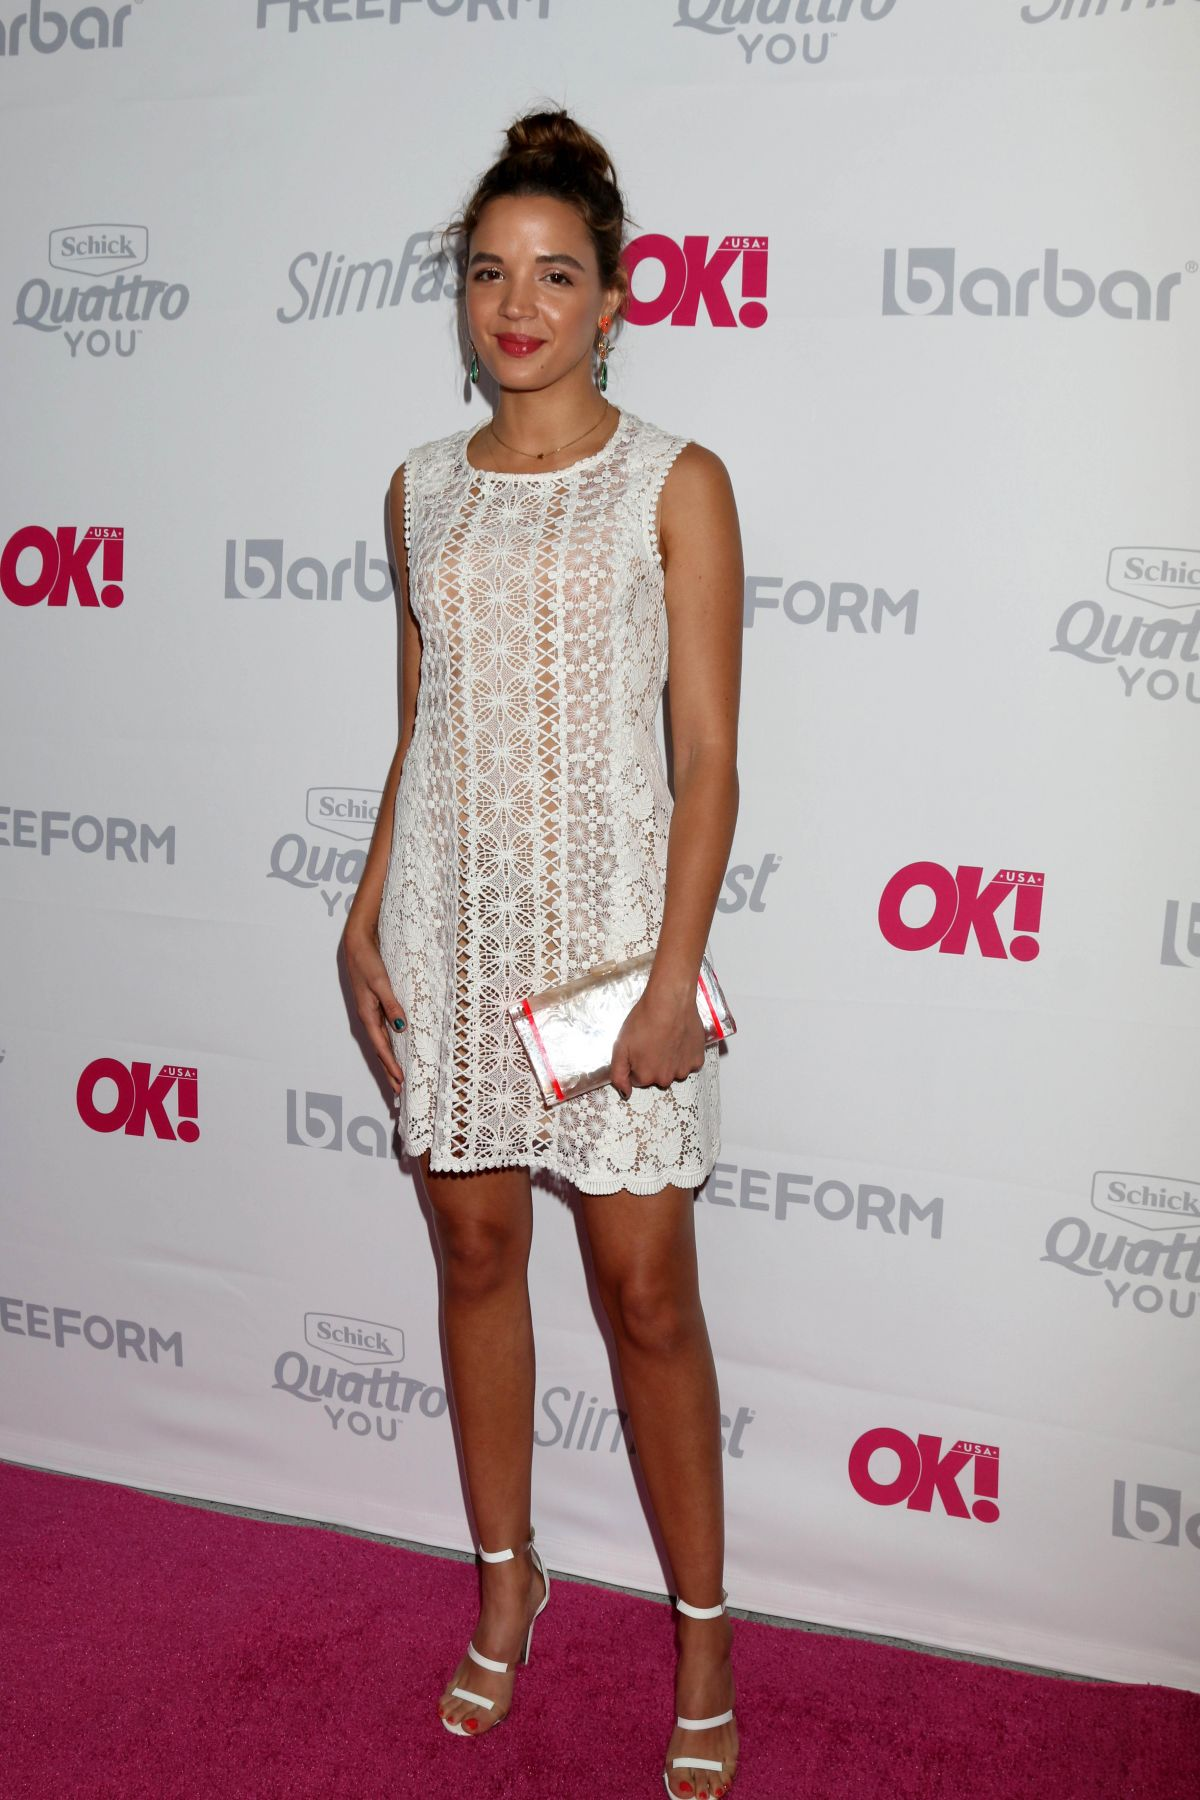 GEORGIE FLORES at OK Magazine Summer Kickoff in Los Angeles 05/17/2017